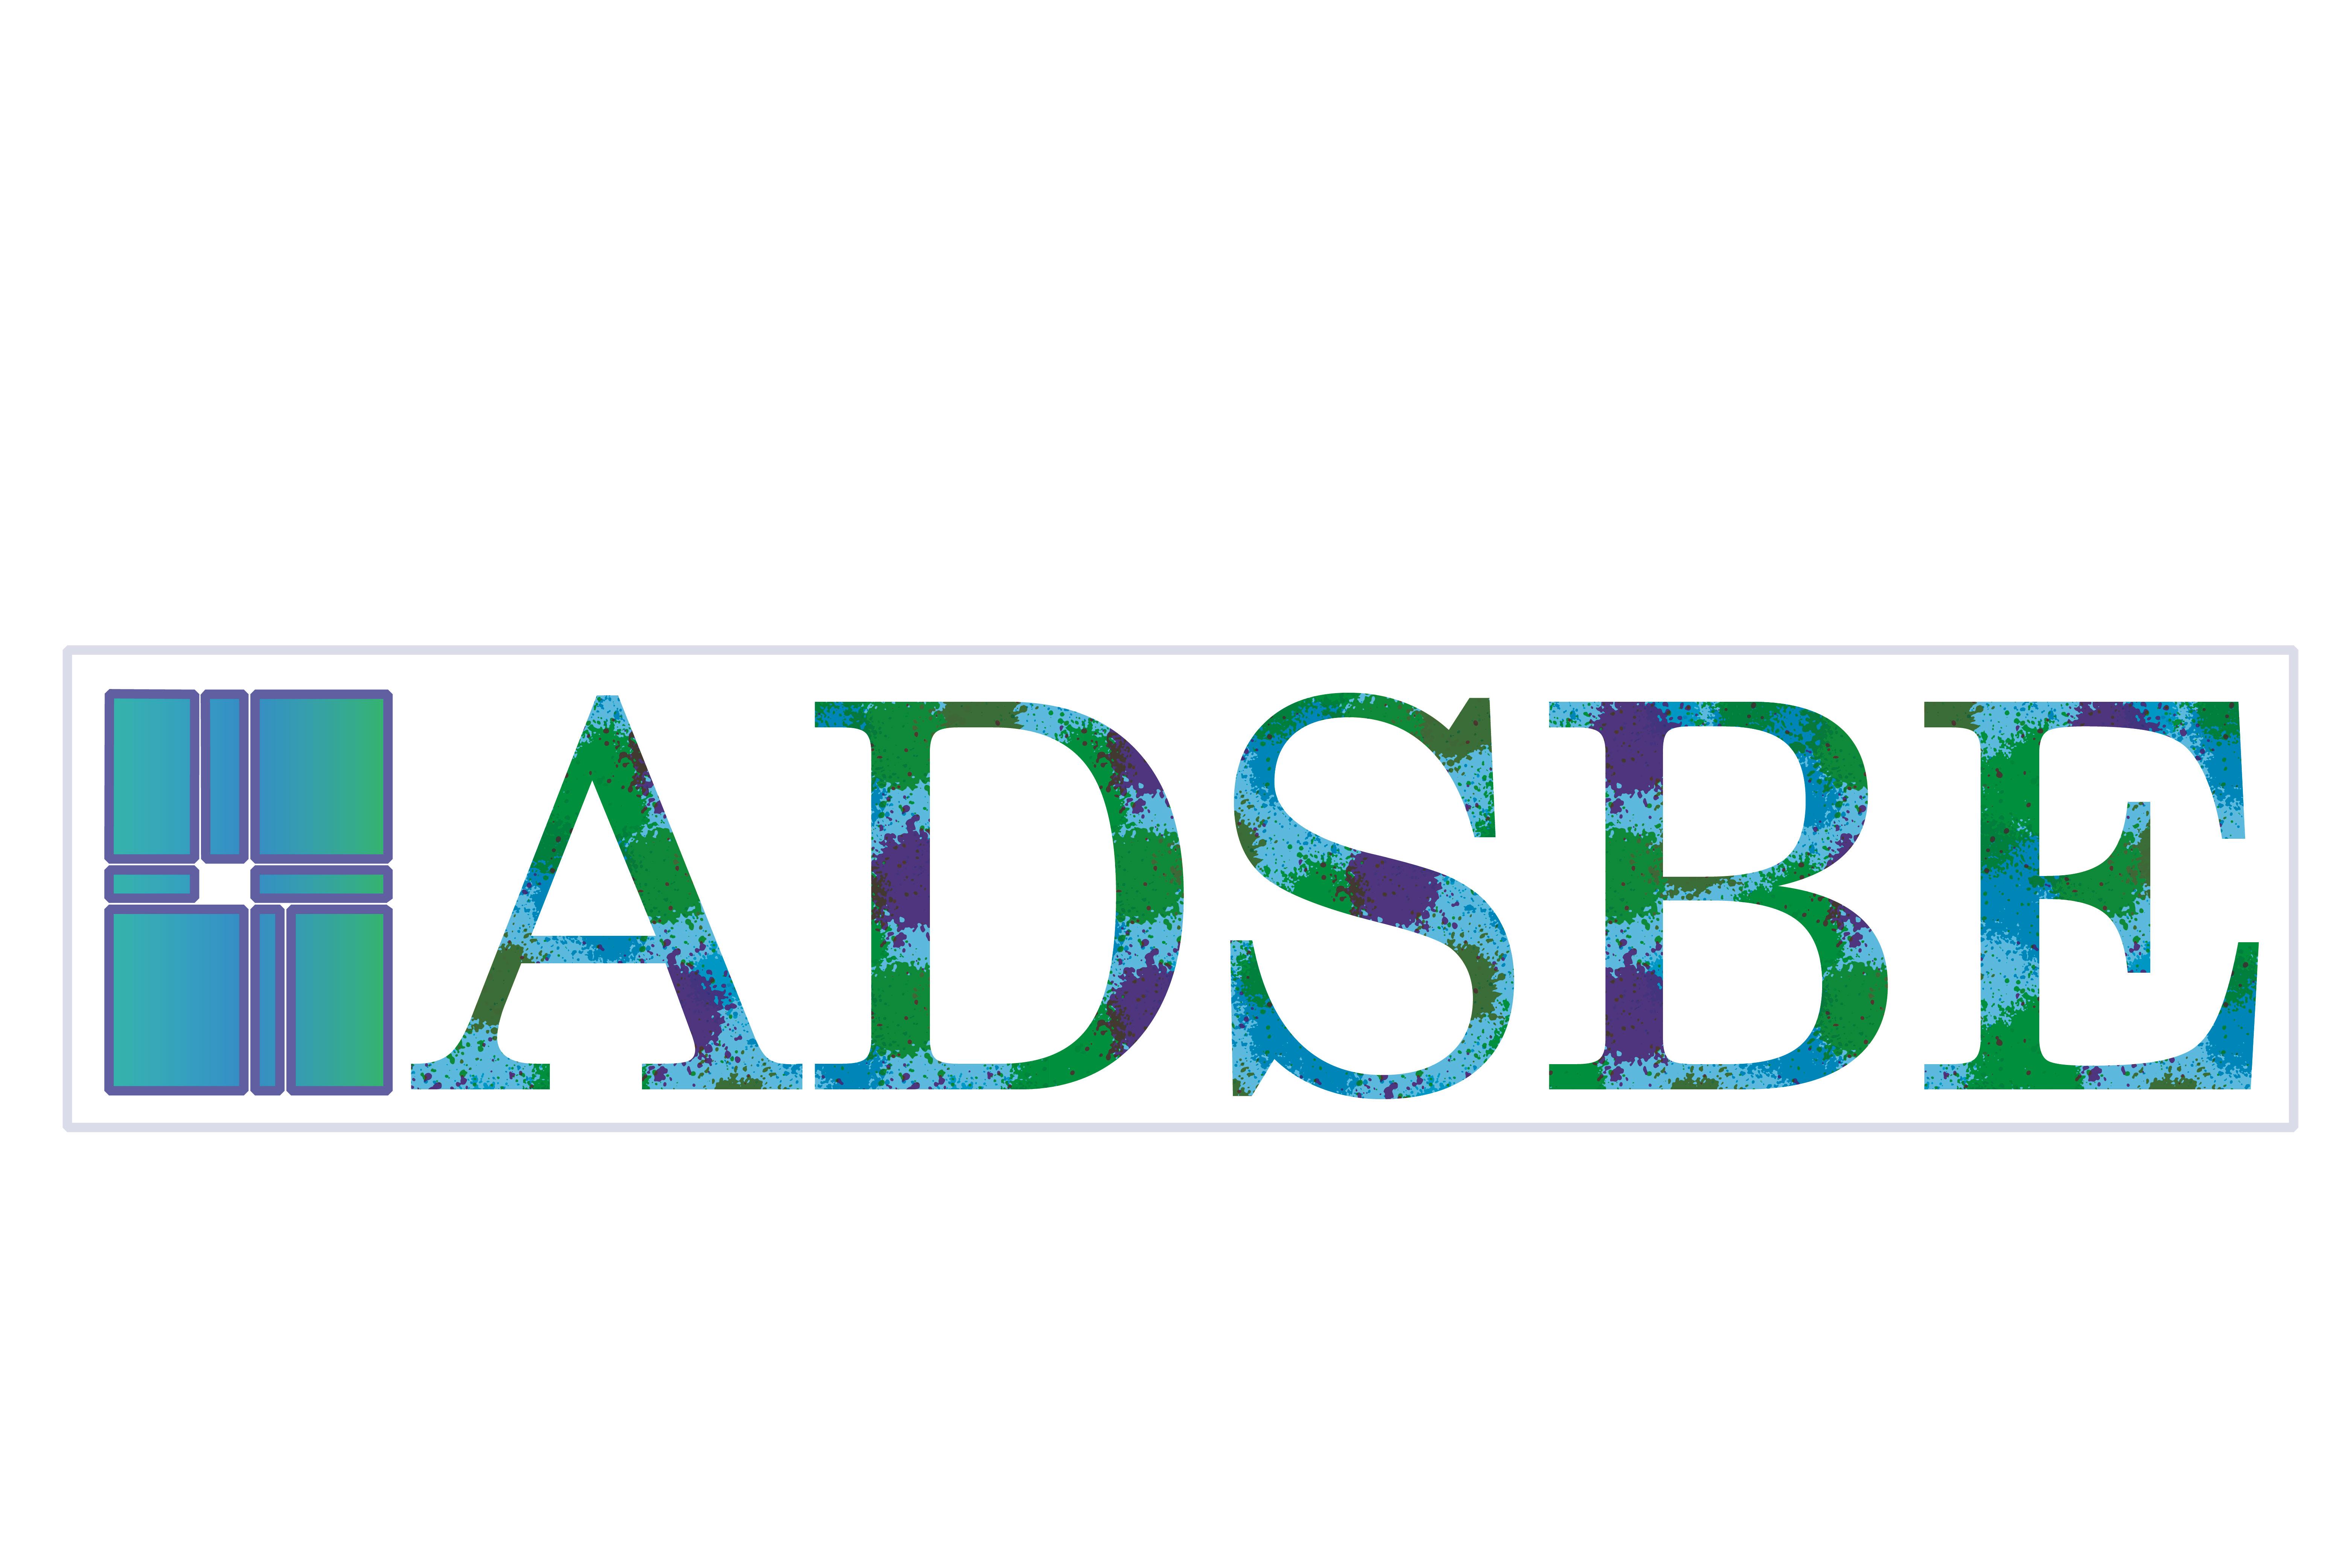 Разработка логотипа для CPA-сети фото f_7515875ef3f57869.jpg